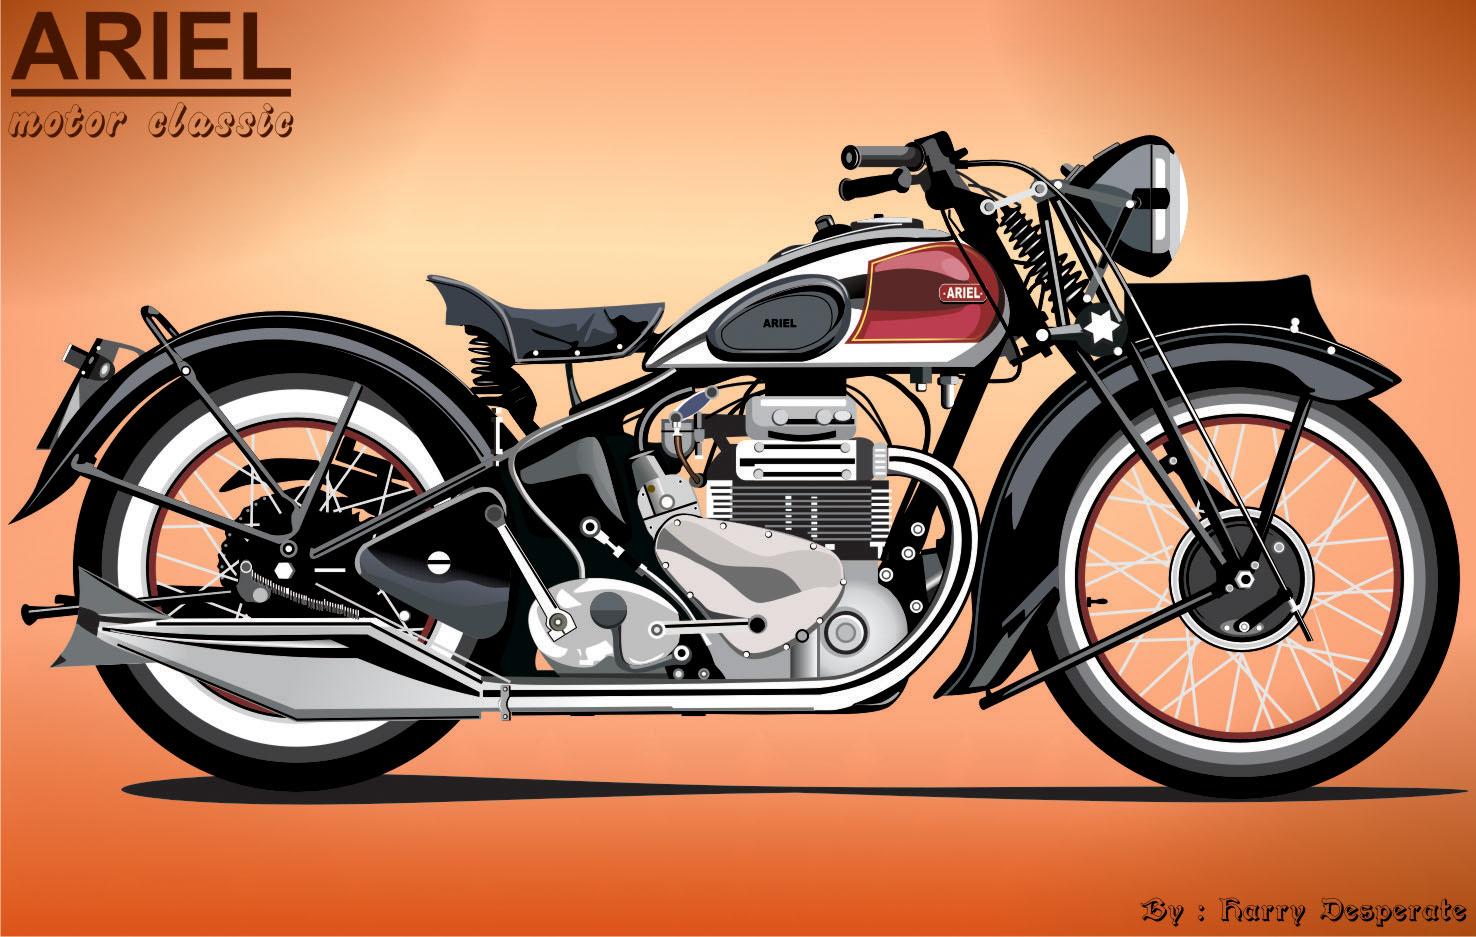 Ariel Motor Klasik By Harrypotro On Deviantart